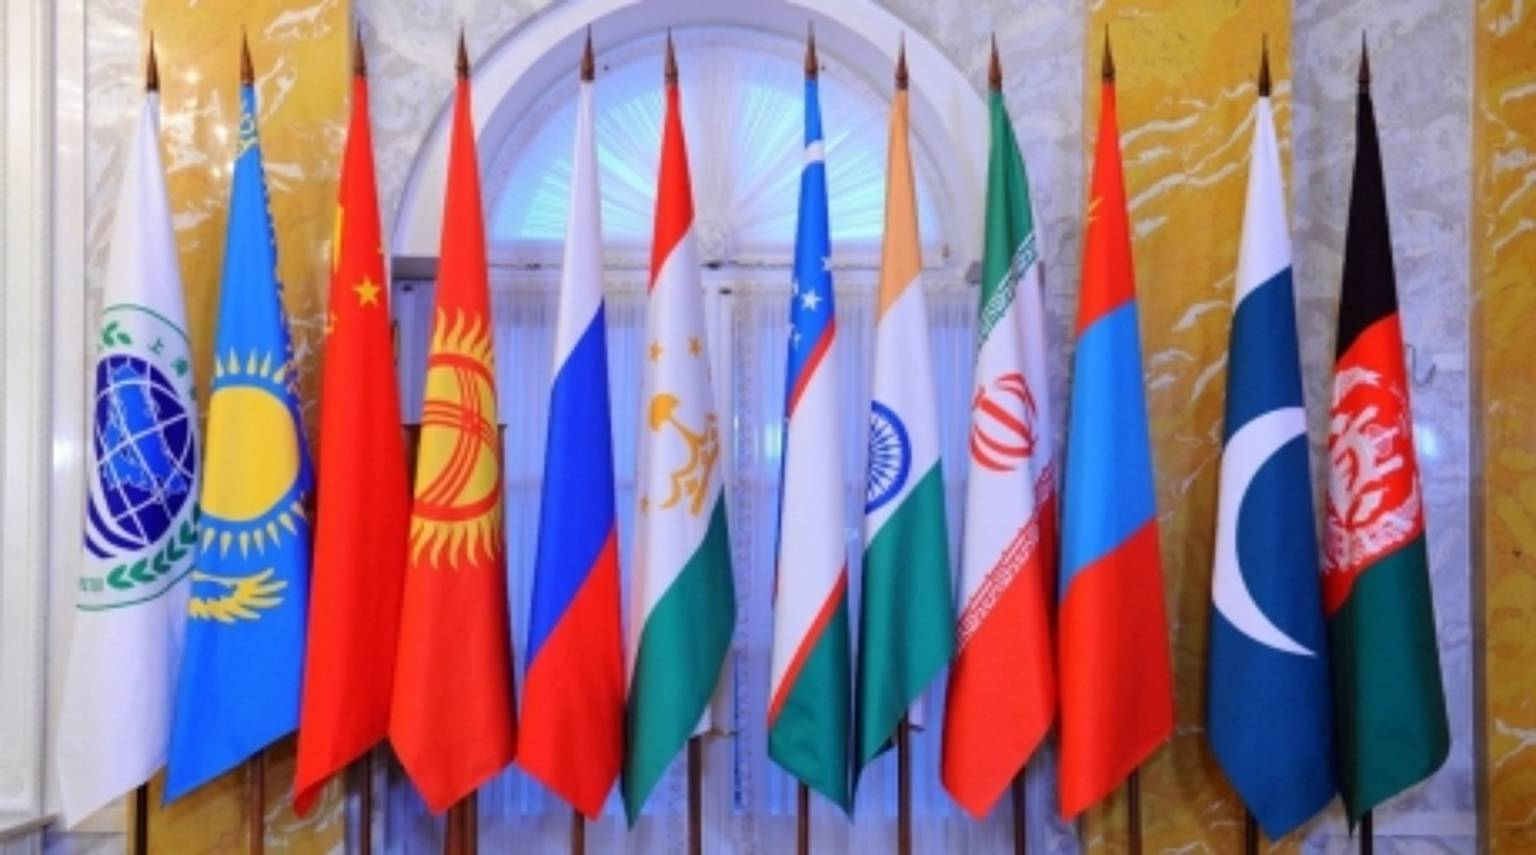 Председательство в Совете РАТС ШОС перешло к Республике Узбекистан